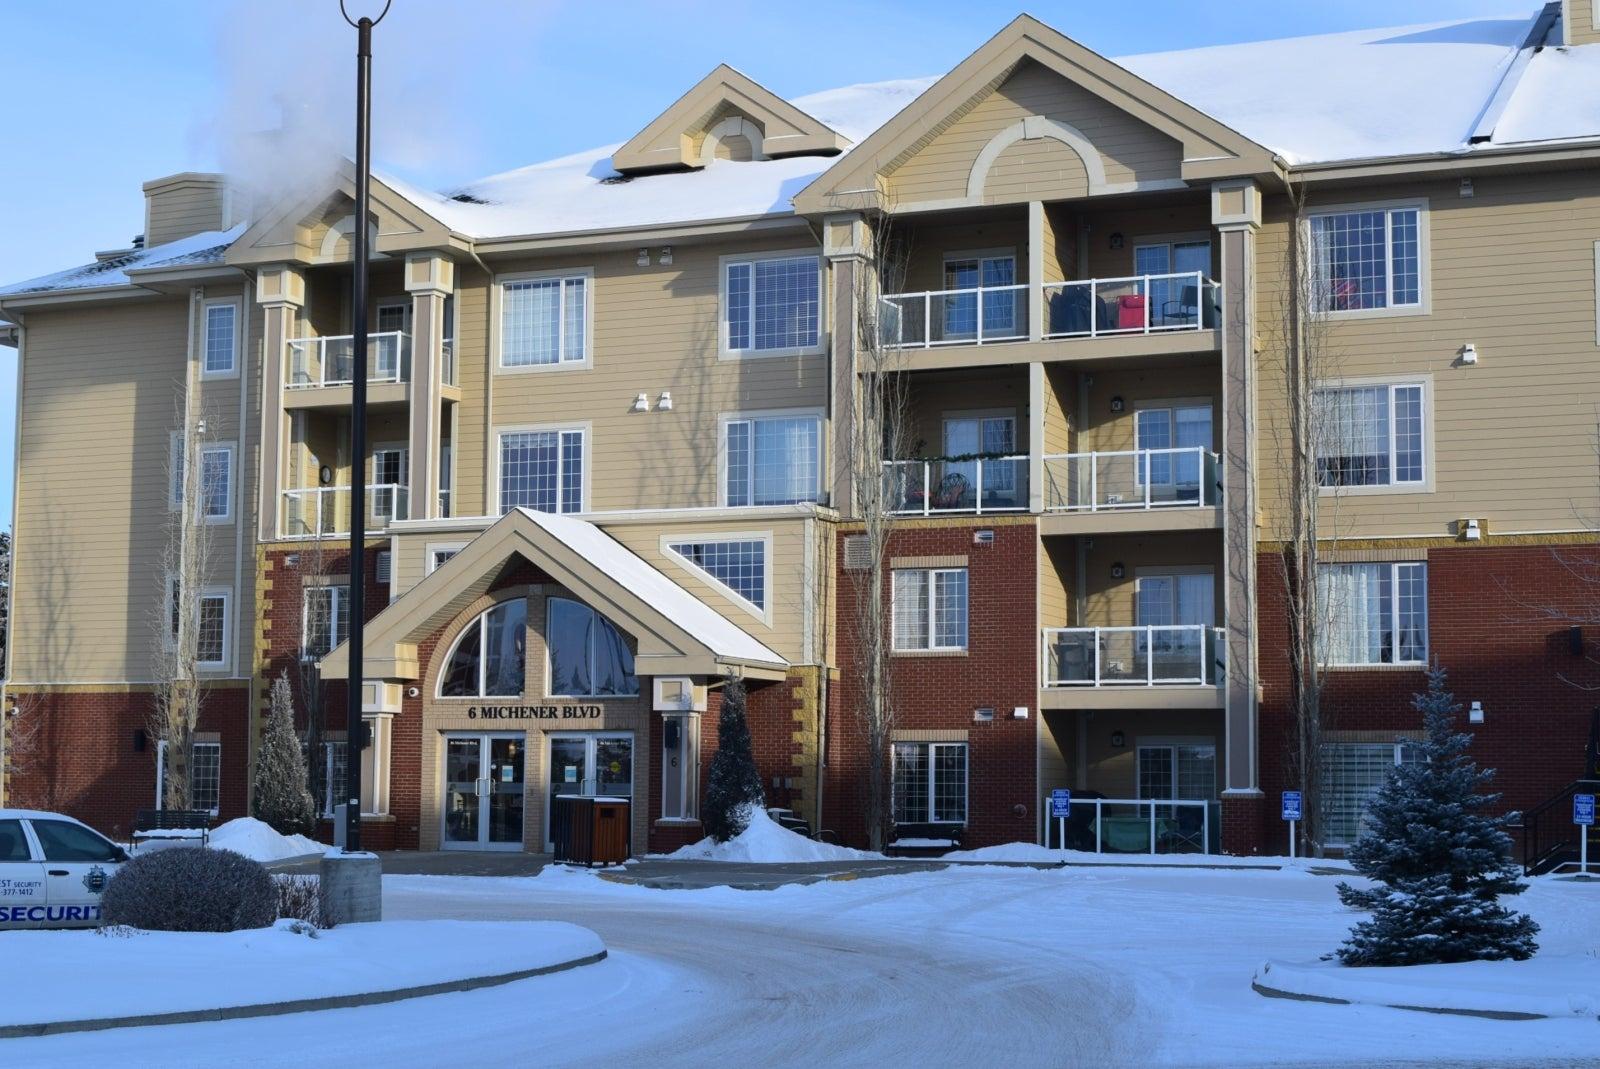 413 6 Michener Blvd, Red Deer, AB  - Michener Hill Condominium Apartment for sale(A1079529) #1